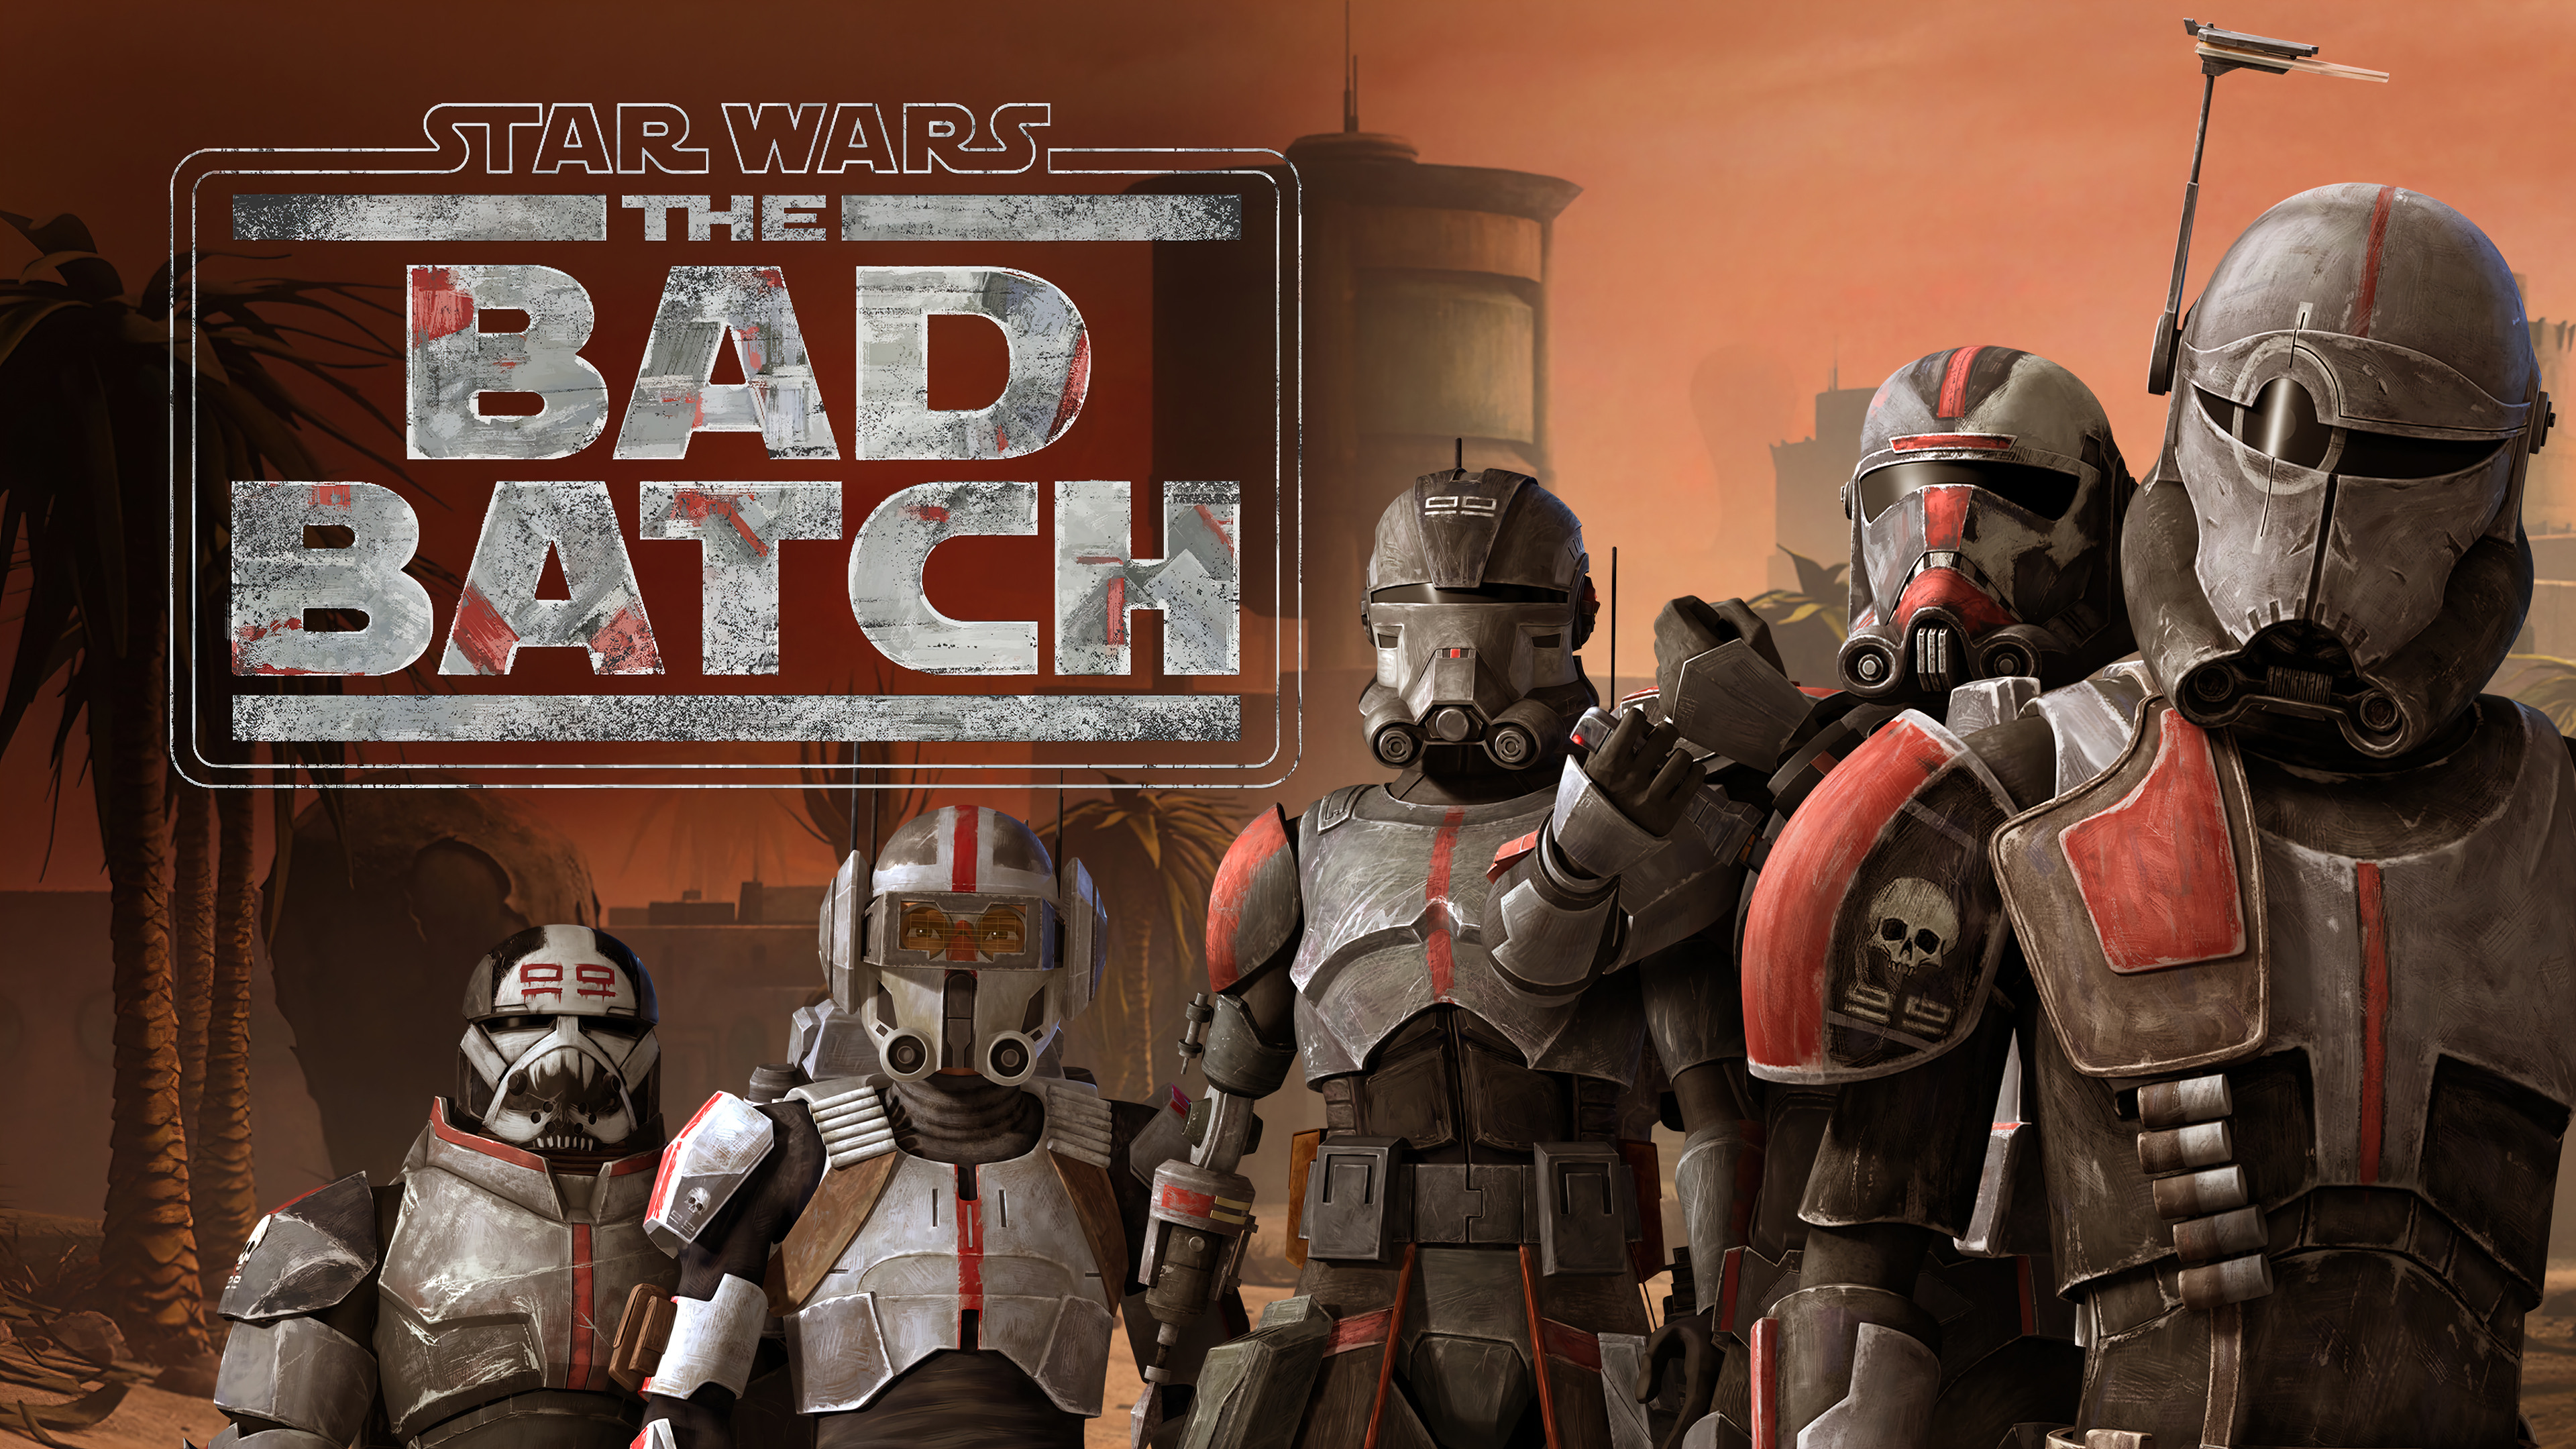 Wallpaper Star Wars The Bad Batch Members Clone Trooper